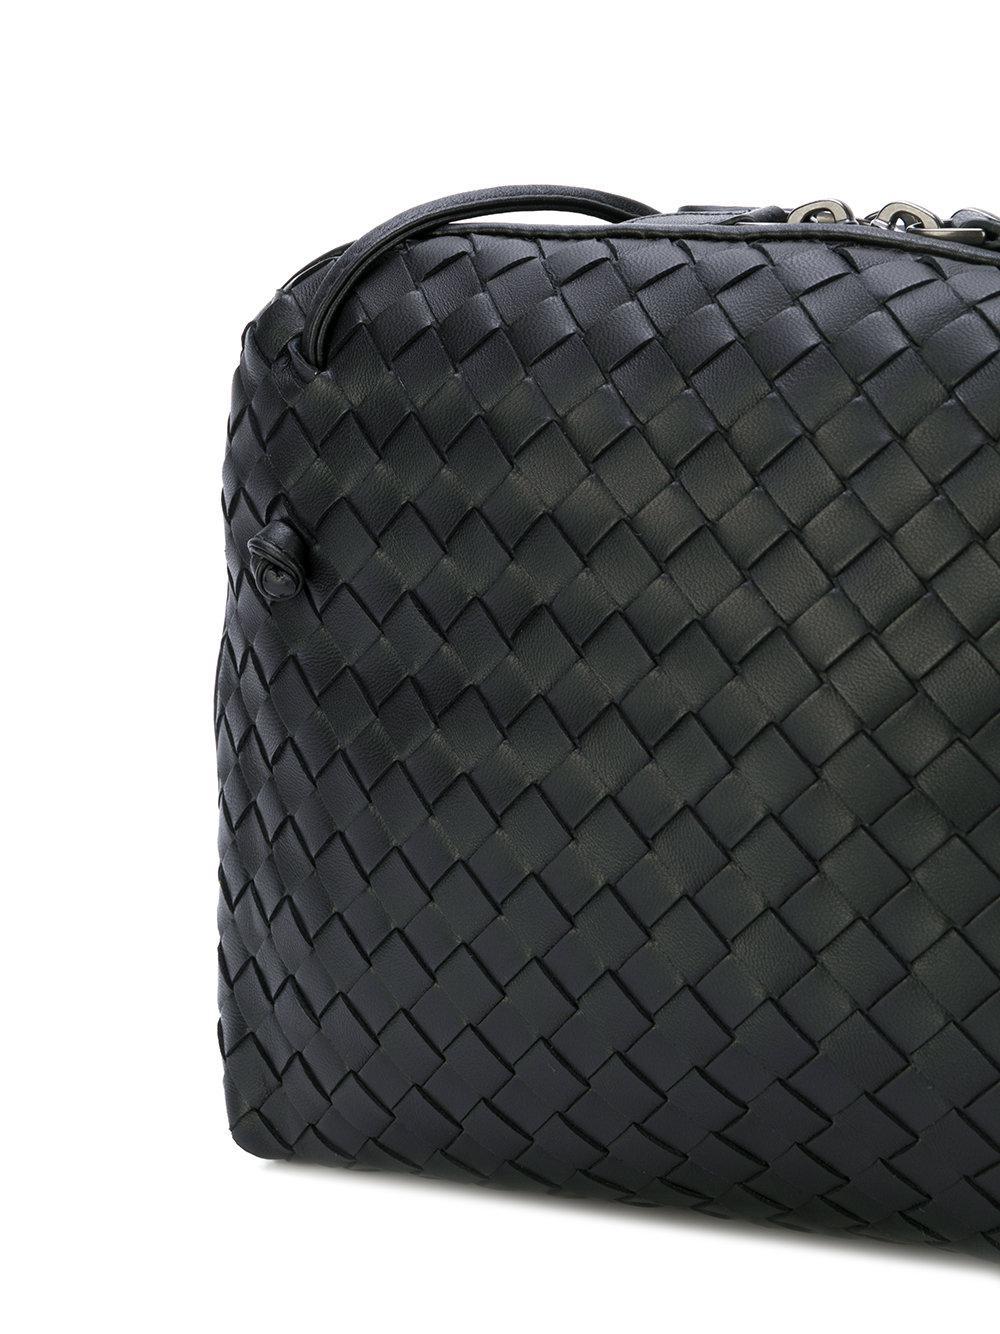 56f68bce2d Bottega Veneta - Black - Textured Crossbody Bag - Women - Leather - One  Size -. View fullscreen